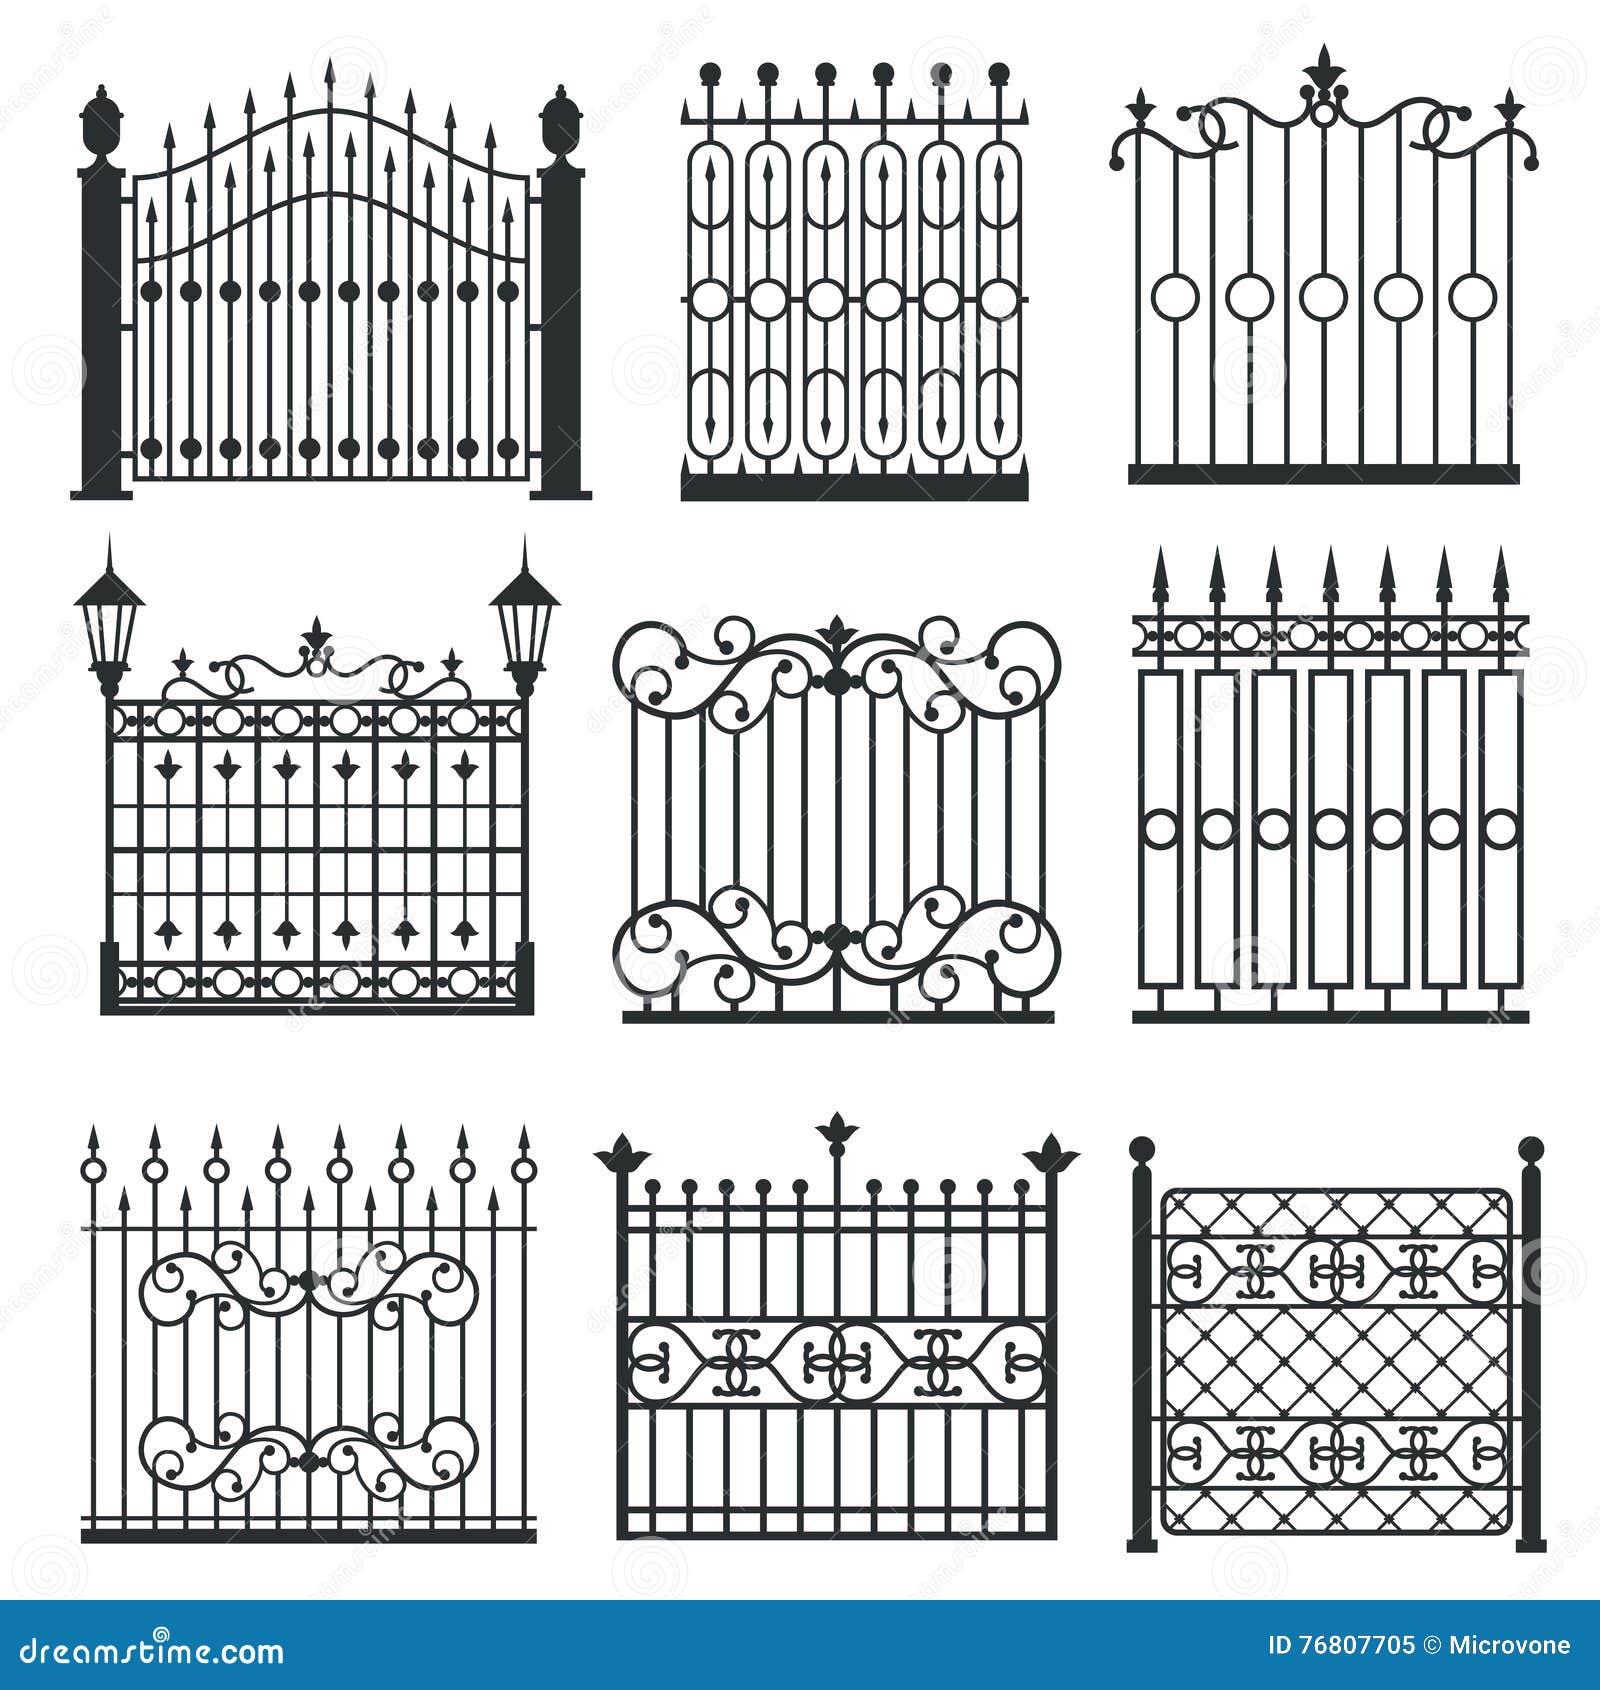 Metal Iron Gates Grilles Fences Vector Set Cartoon